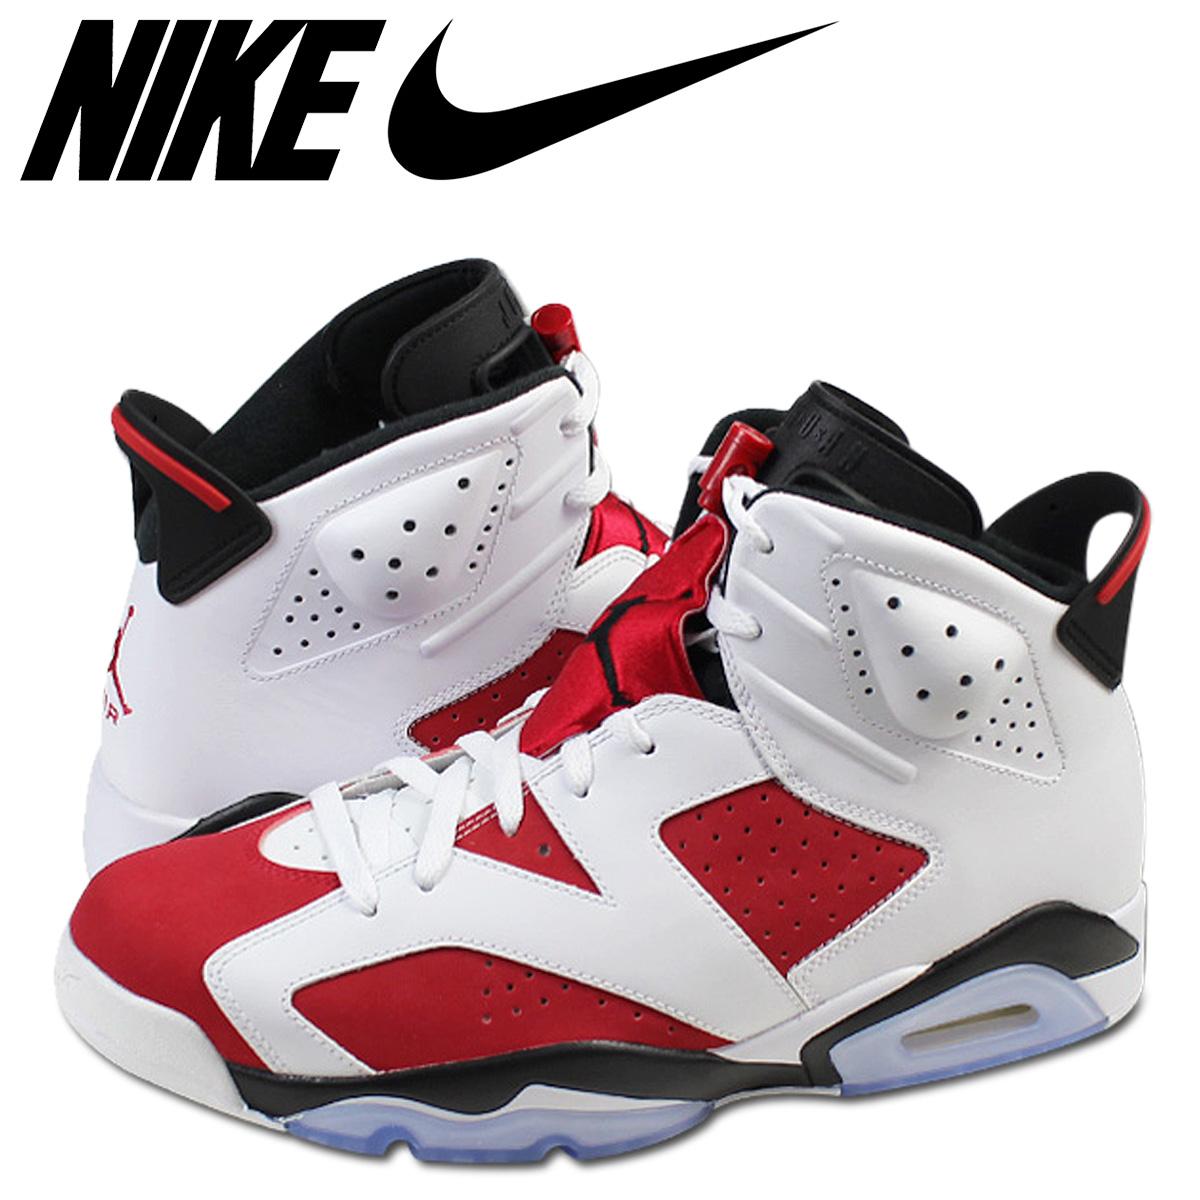 the best attitude 61997 64b59 NIKE Nike Air Jordan 6 nostalgic sneakers AIR JORDAN 6 RETRO CARMINE  384,664-160 carmine men shoes white